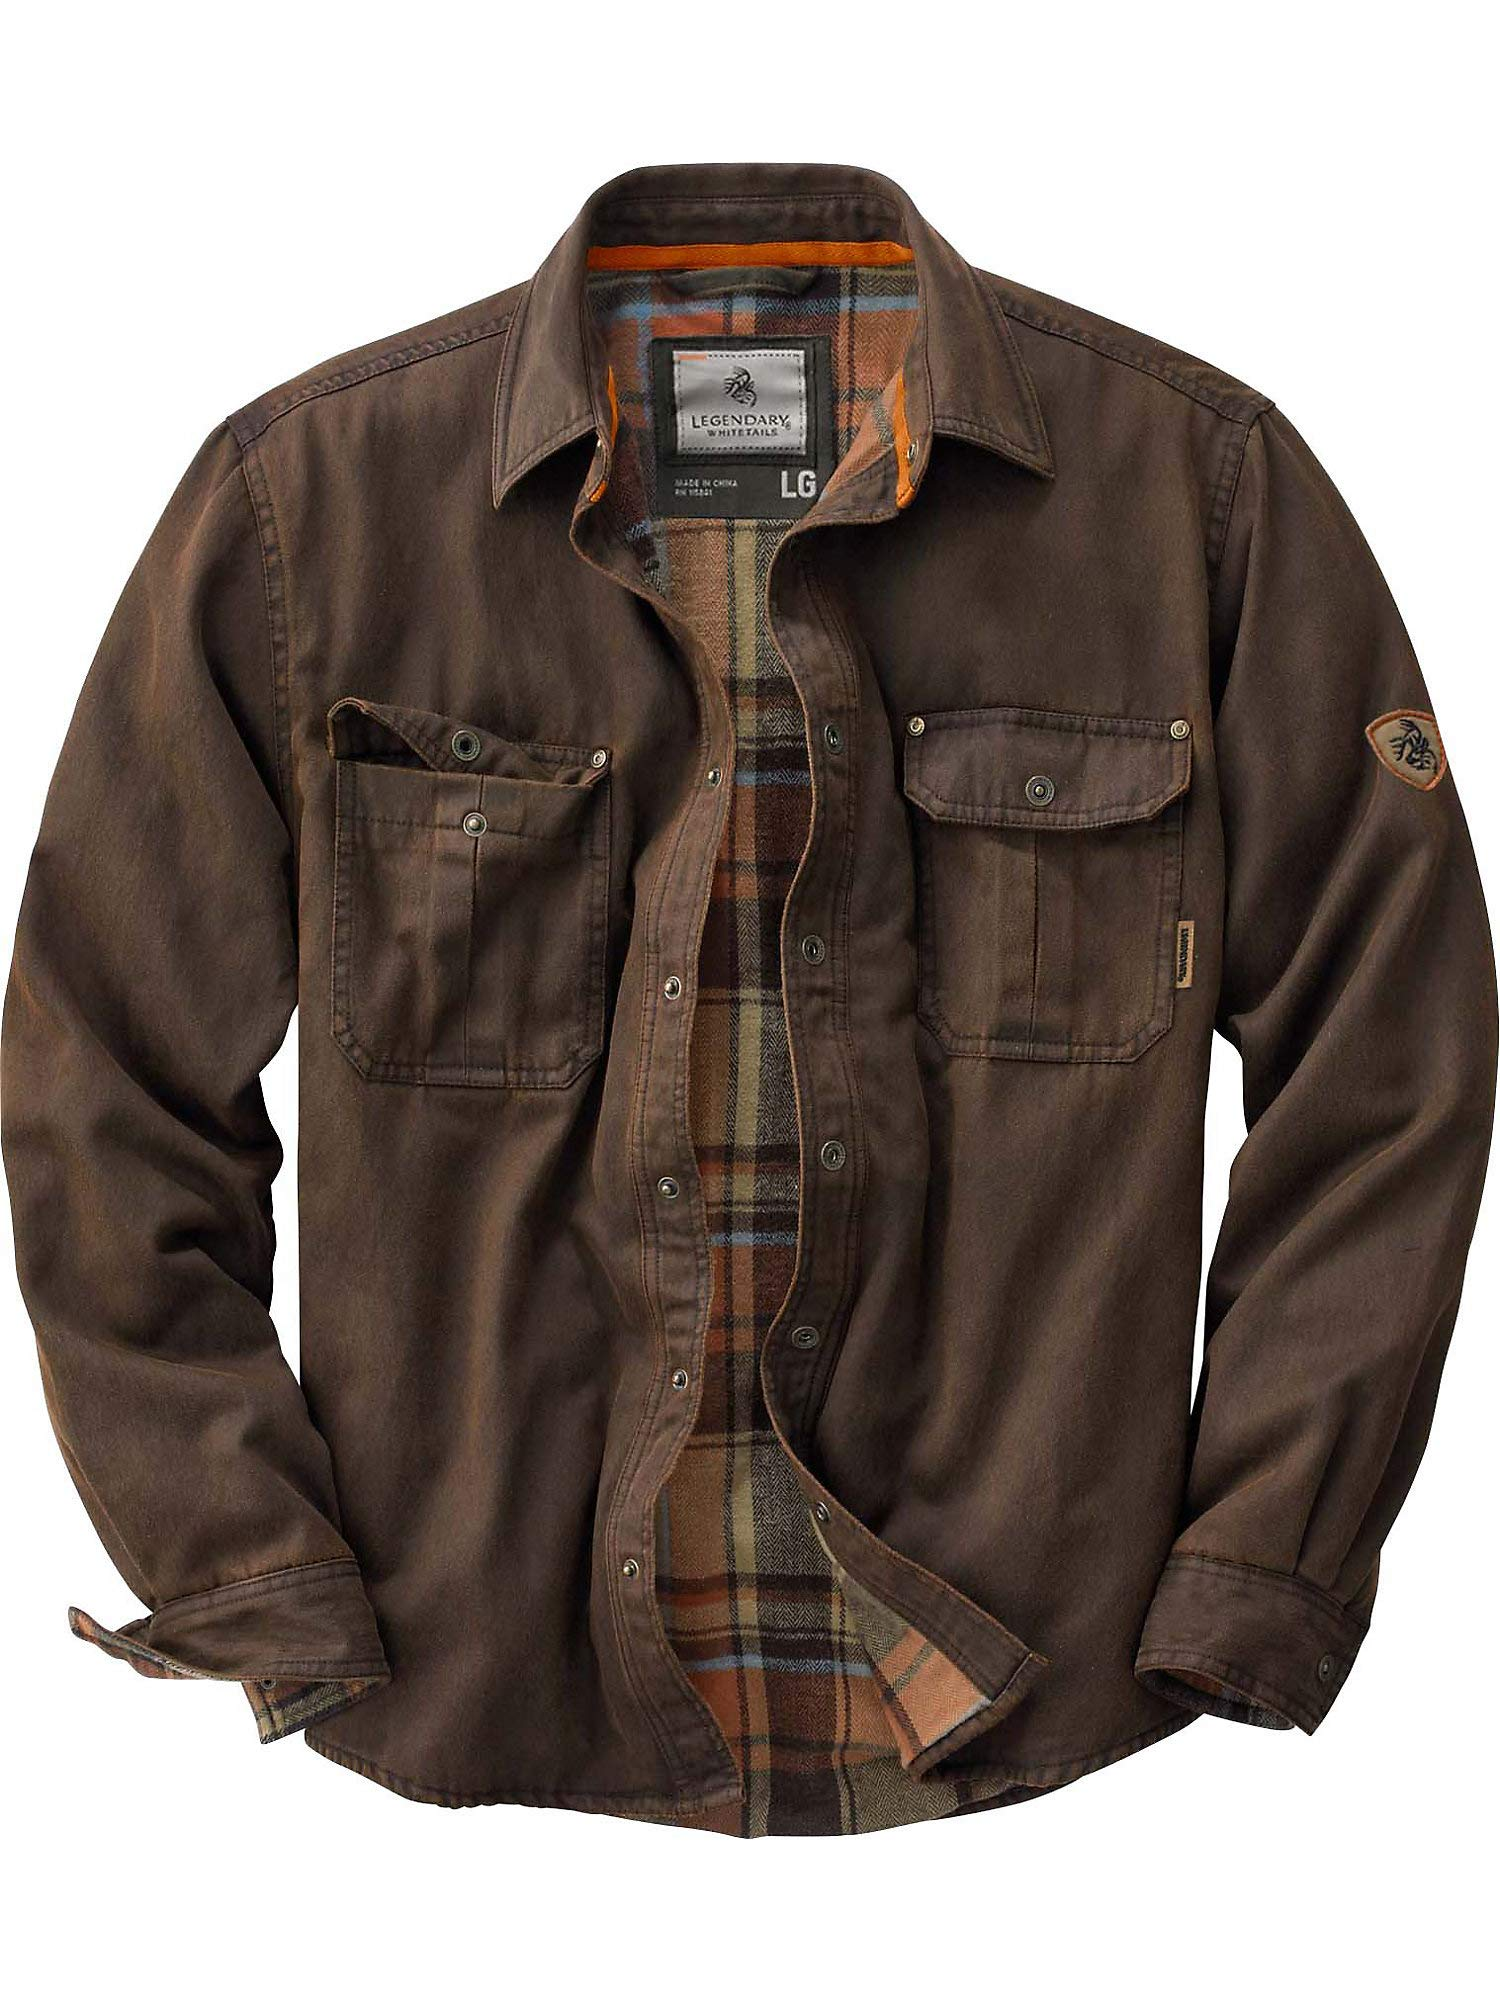 Legendary Whitetails Men's Journeyman Rugged Shirt Jacket, Tobacco, Large by Legendary Whitetails